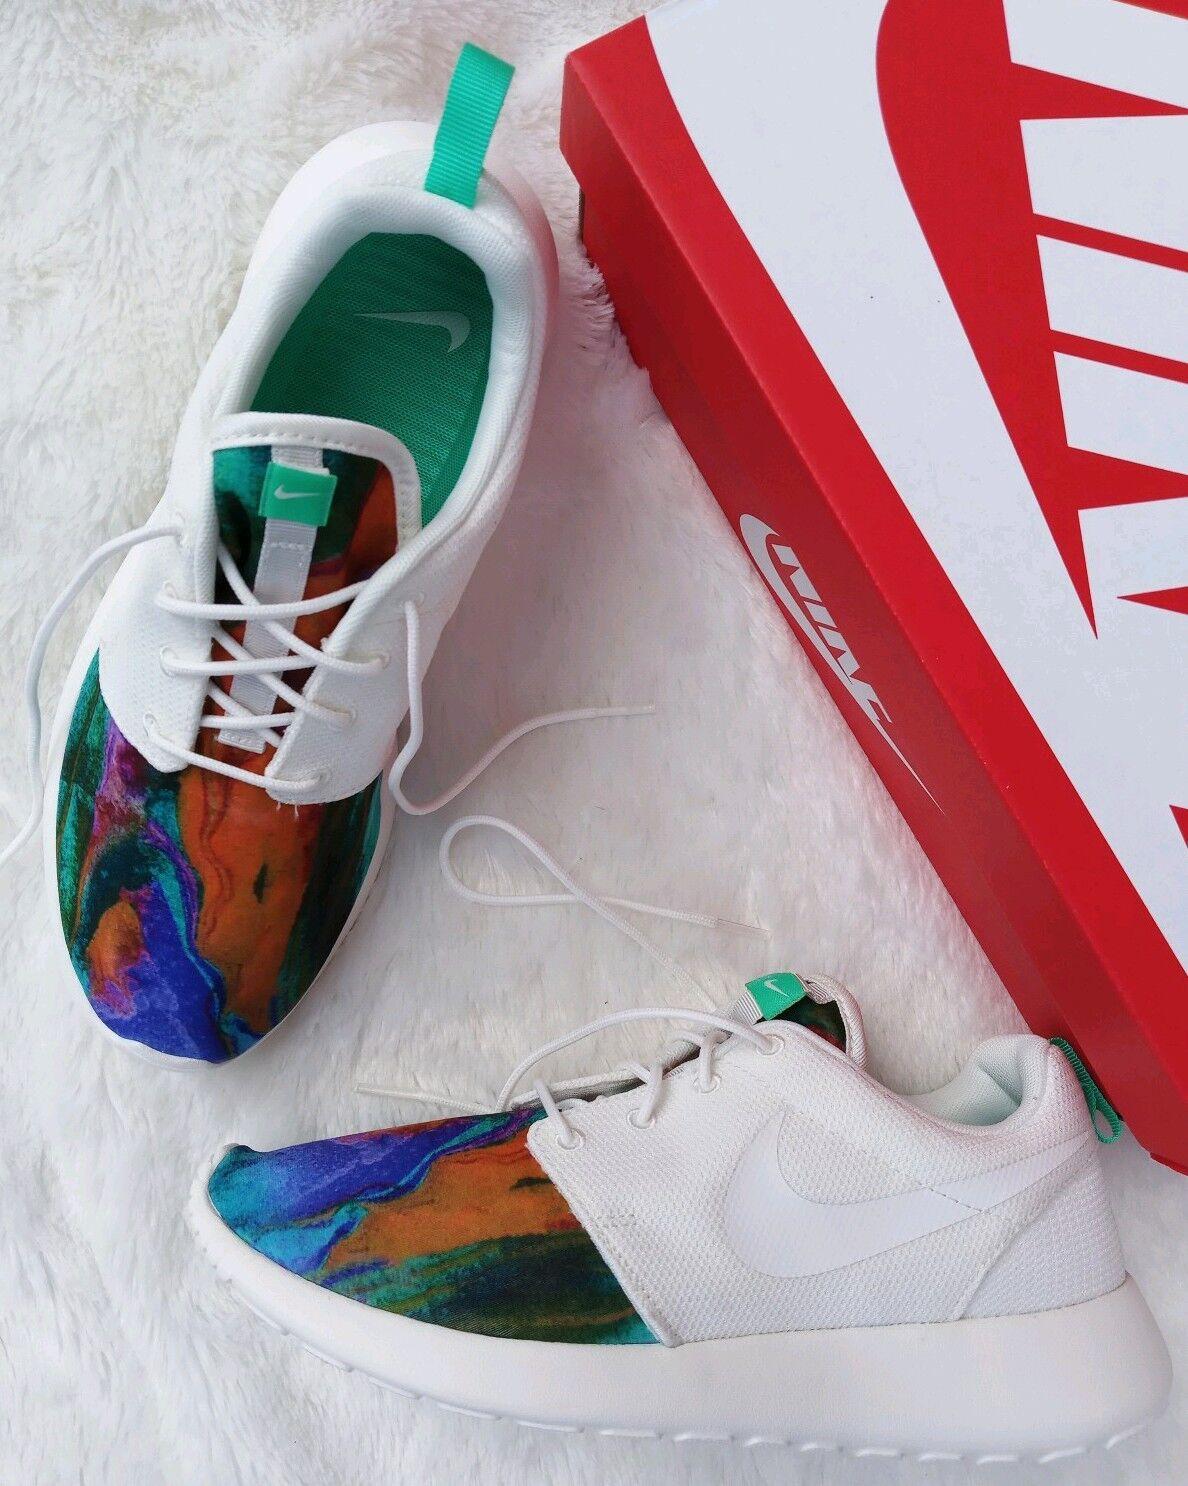 8.5 uomo Nike Roshe One Print Tye Dye AR1950 100 Sail Menta Running scarpe